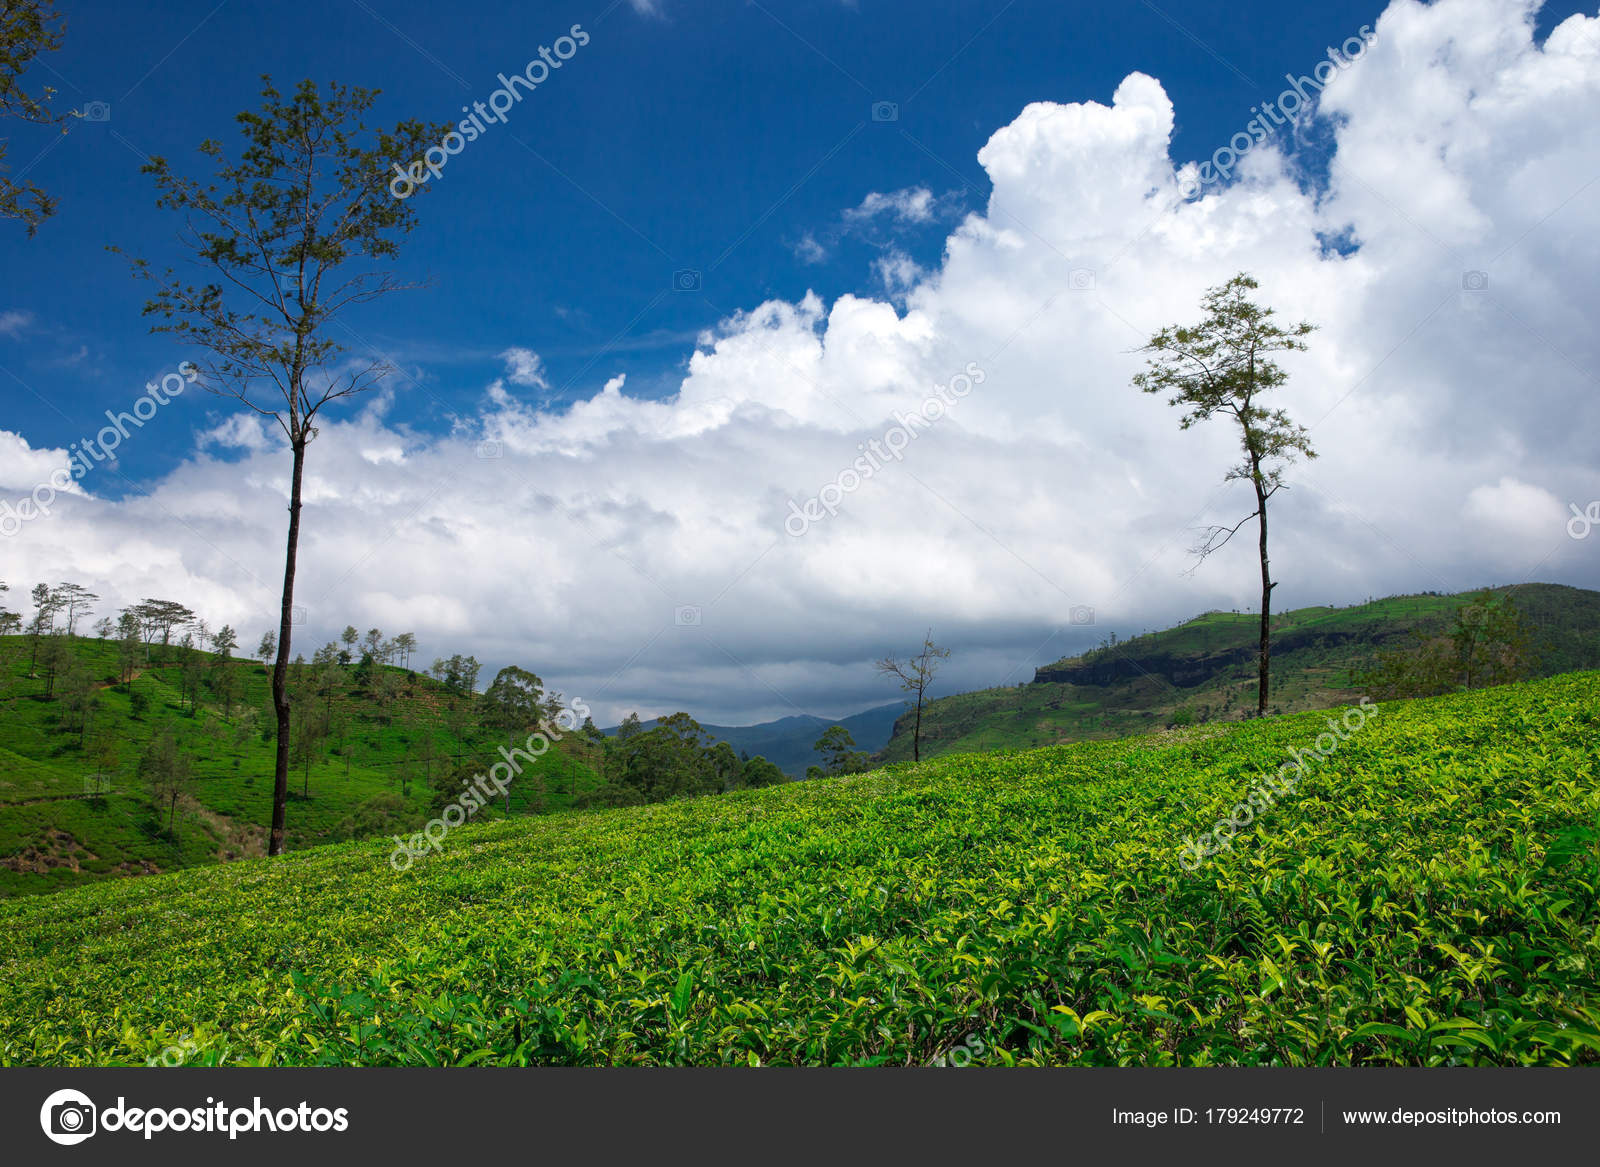 çay Plantasyon Doğal Görünümü Doğa Arka Plan Stok Foto